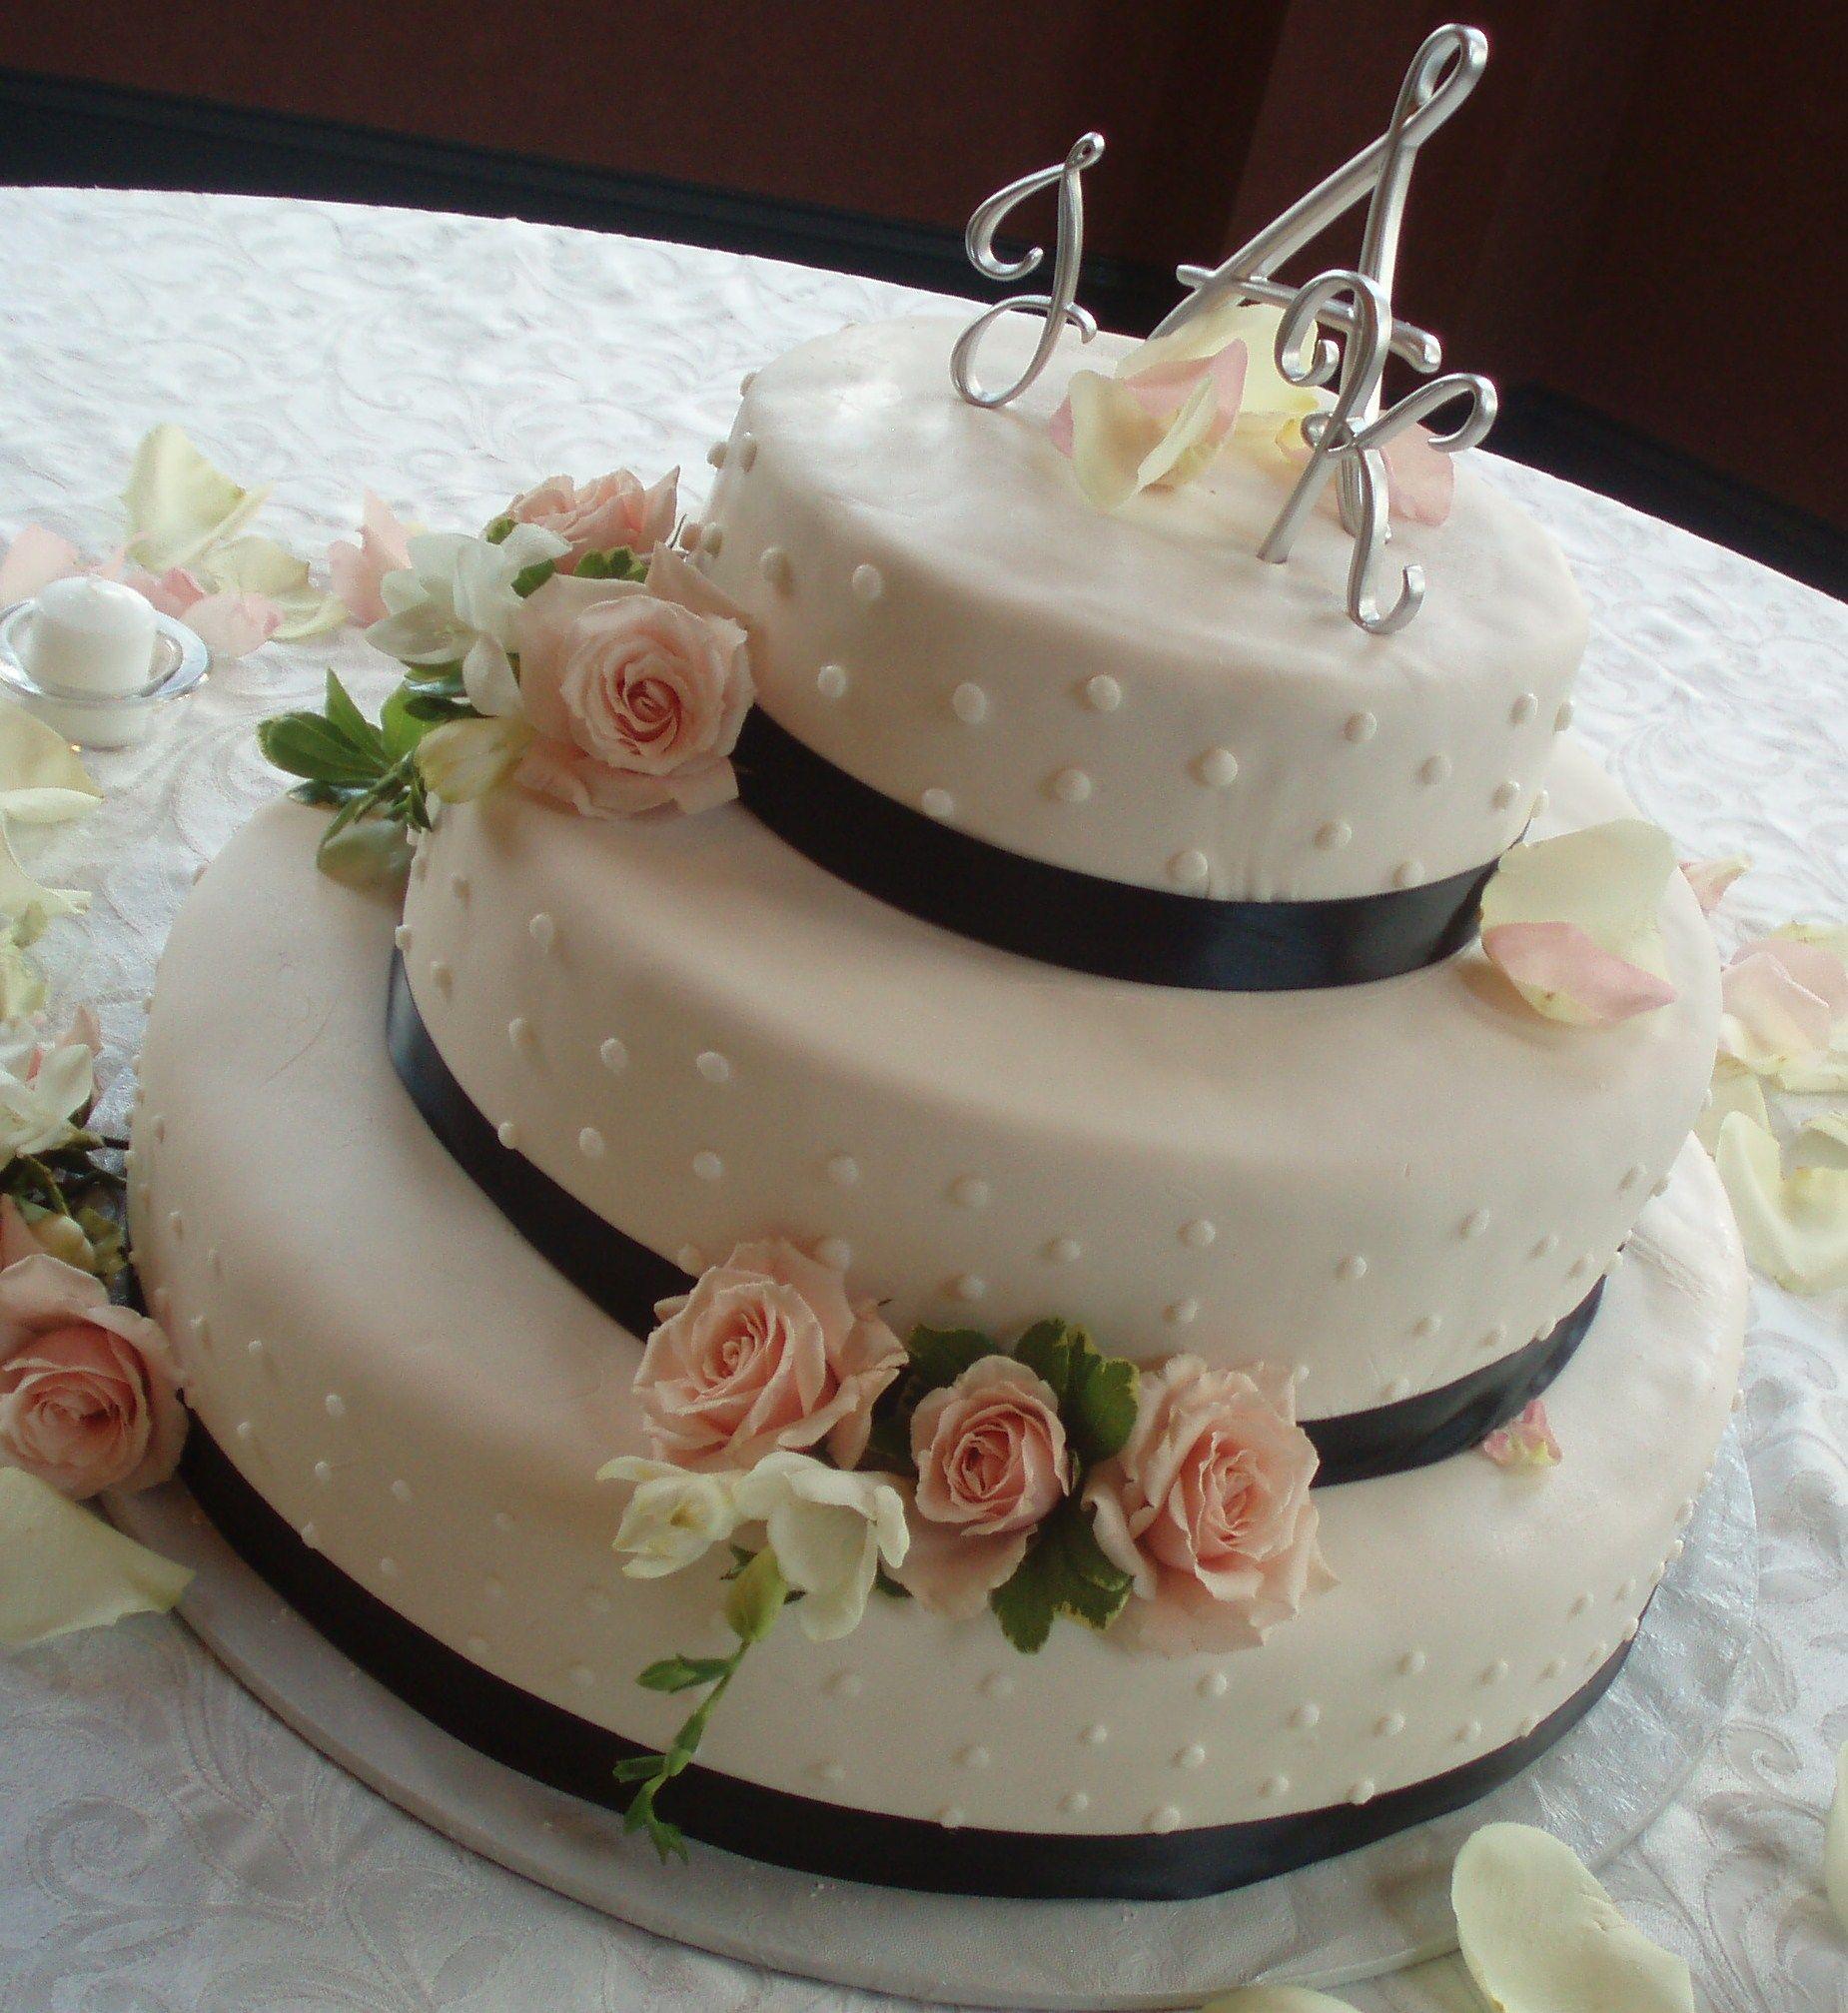 Caramiciu0027s Bakery Does Wedding Cakes! Call Today For A Consultation! # Wedding #floralweddingcake